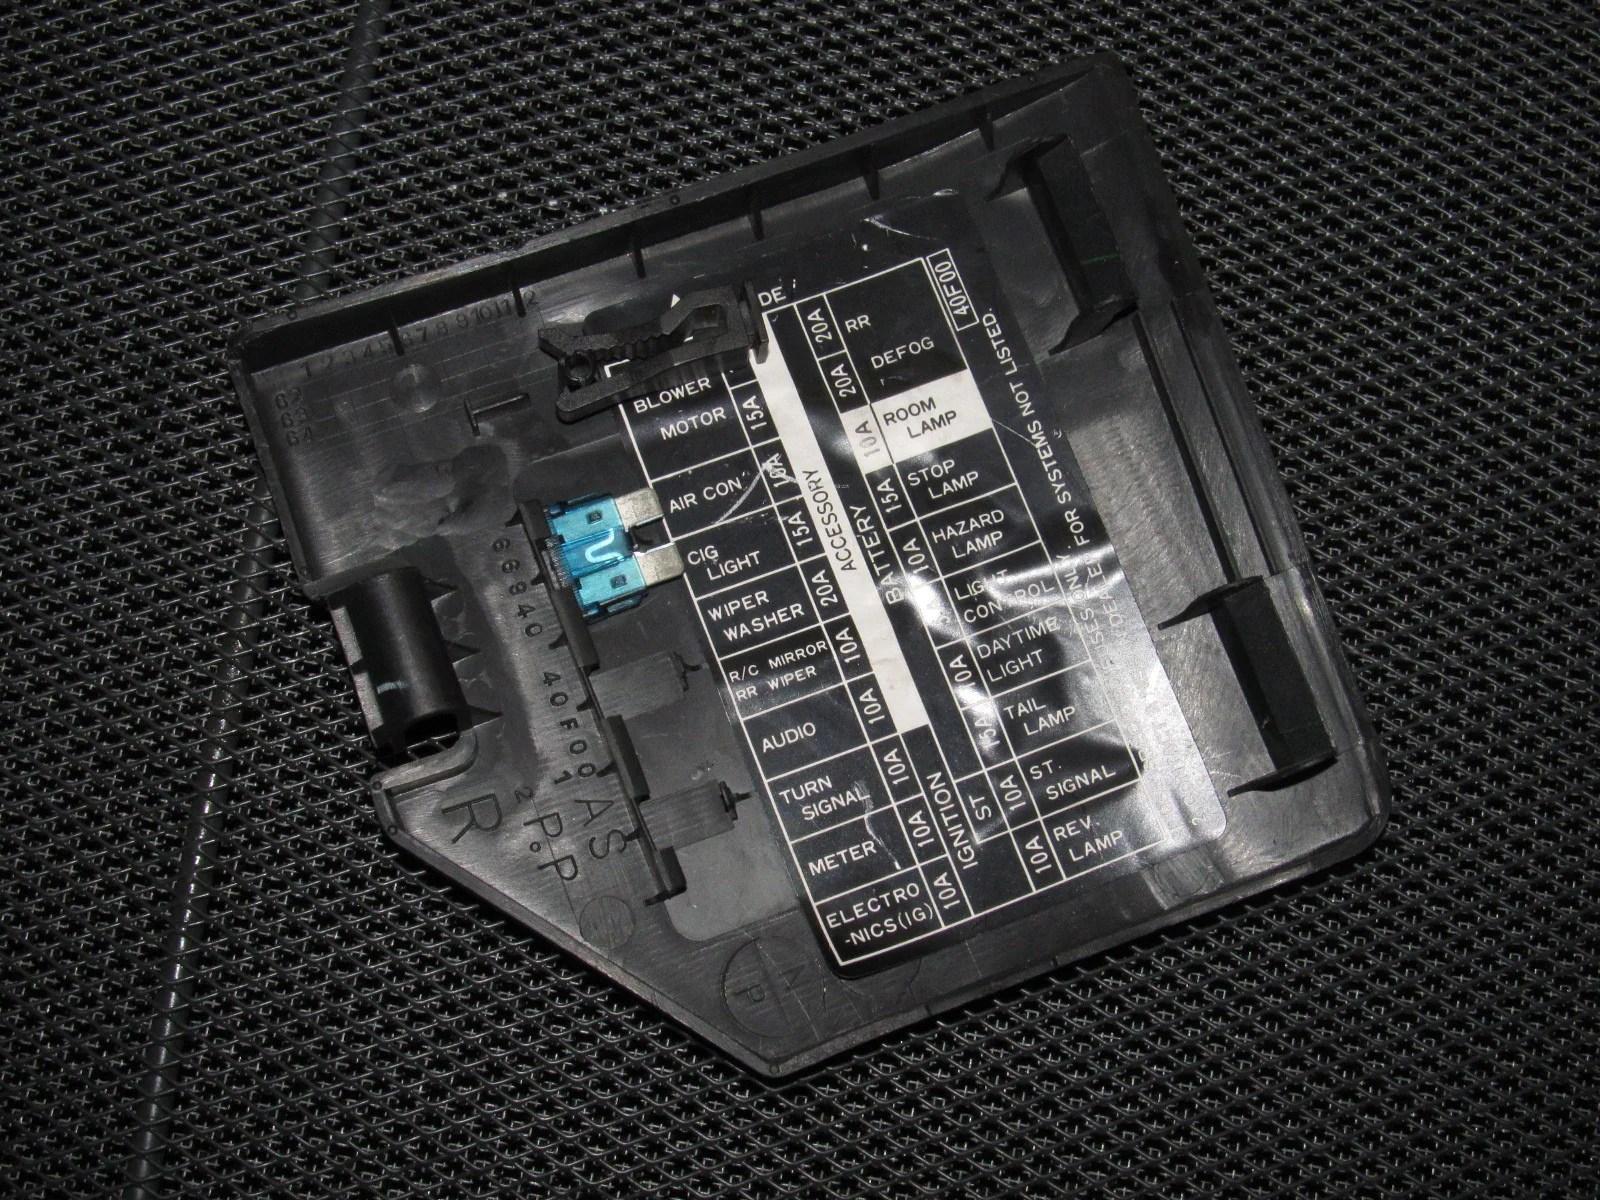 96 240sx fuse diagram wiring diagram 1995 240sx fuse box label wiring diagram